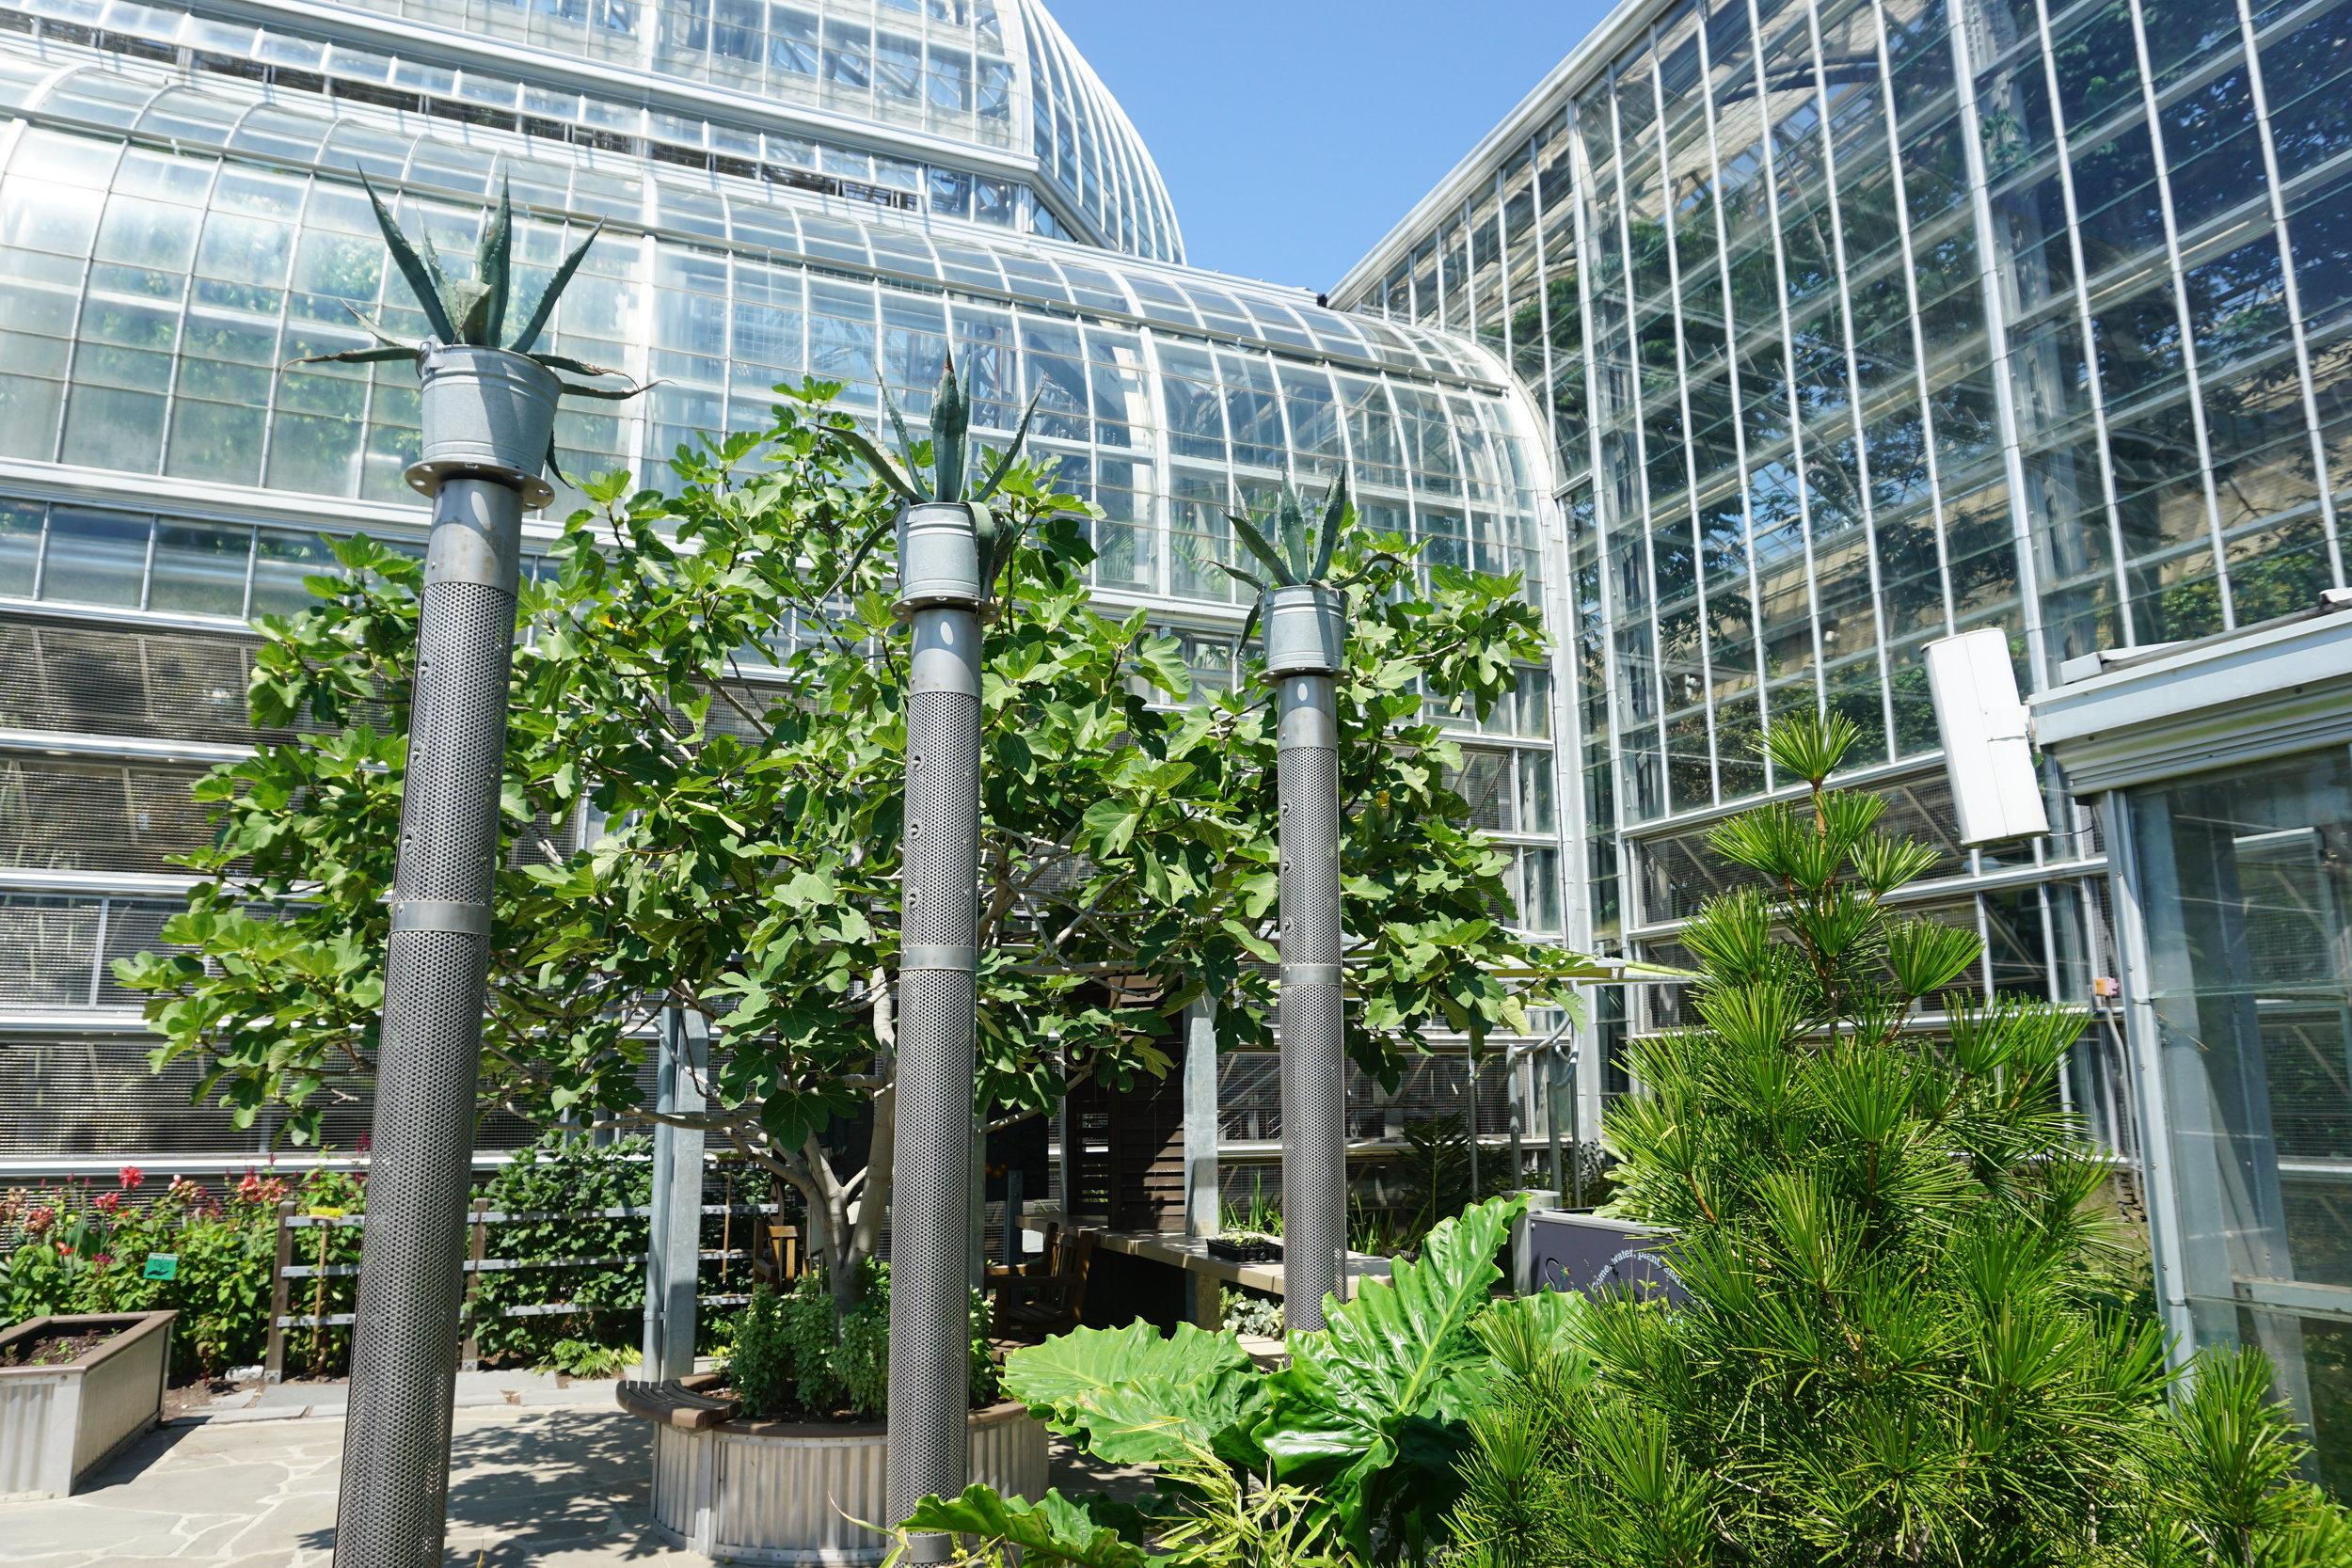 US-Botanic-Gardens-Washington-DC.JPG